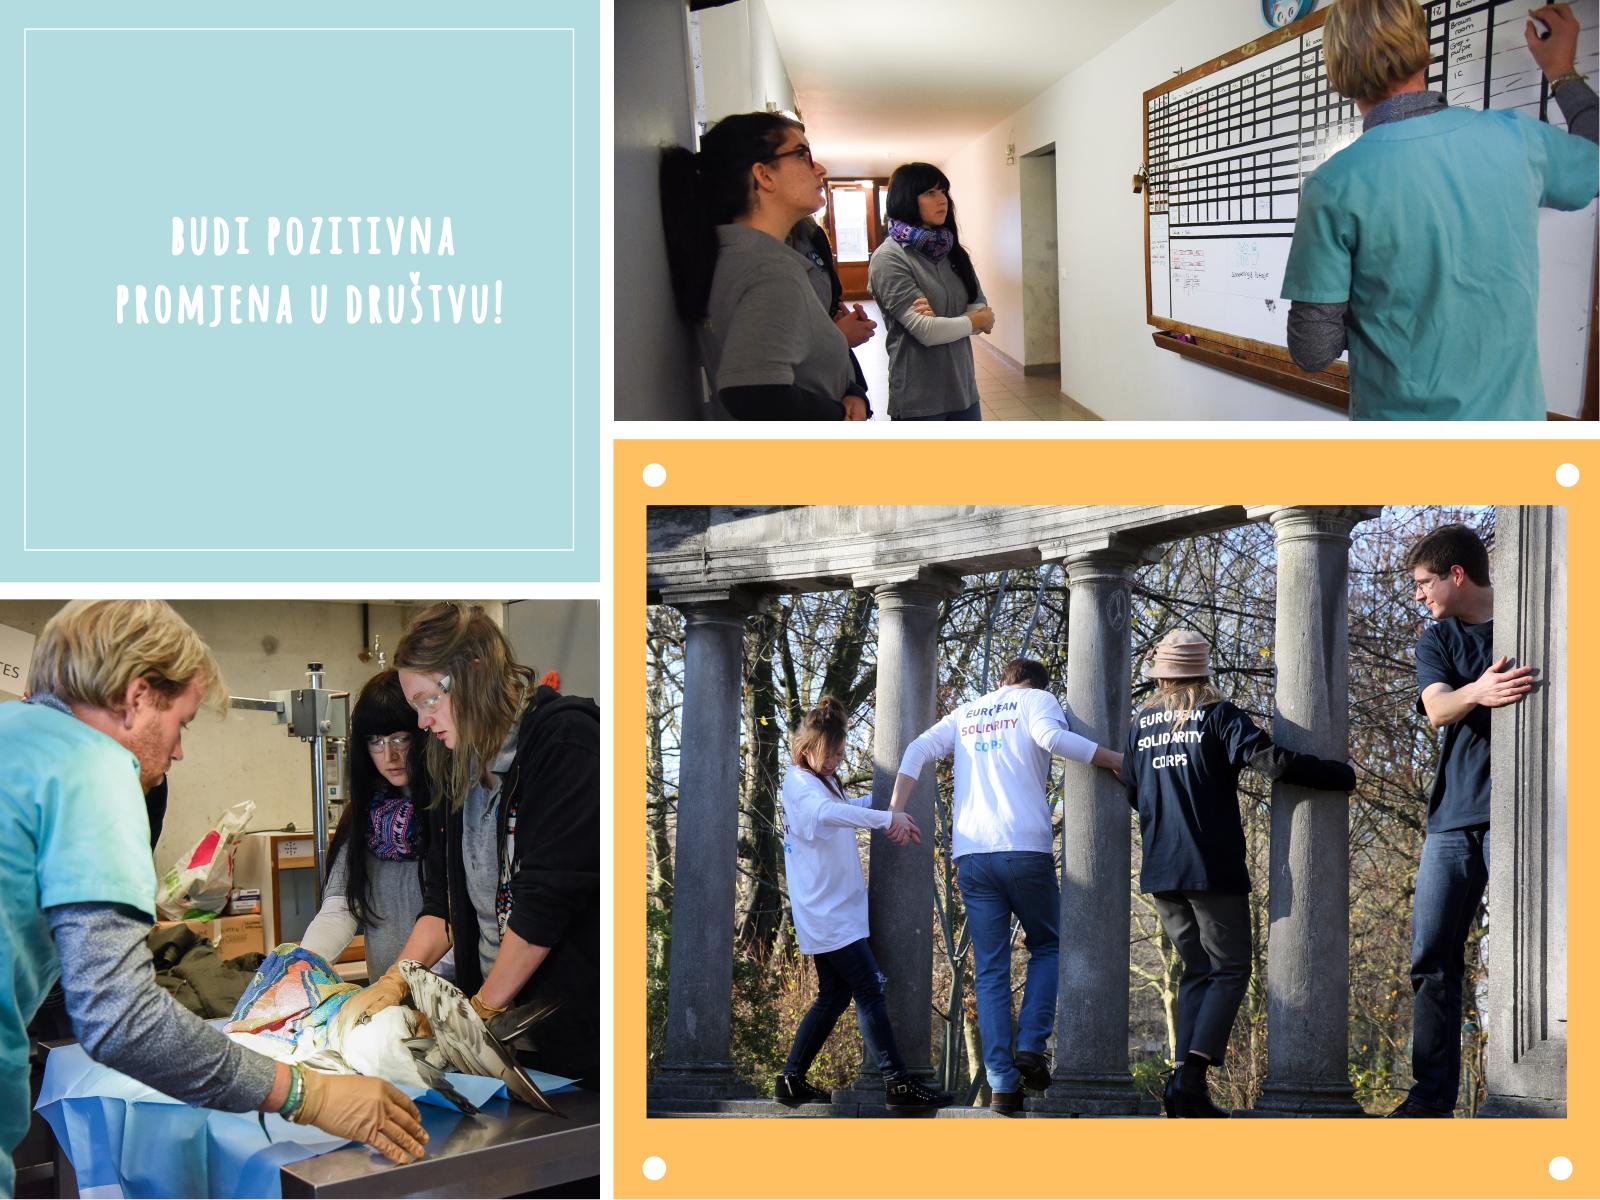 Imam ideju! – online prezentacija Projekata solidarnosti i kako ih prijaviti